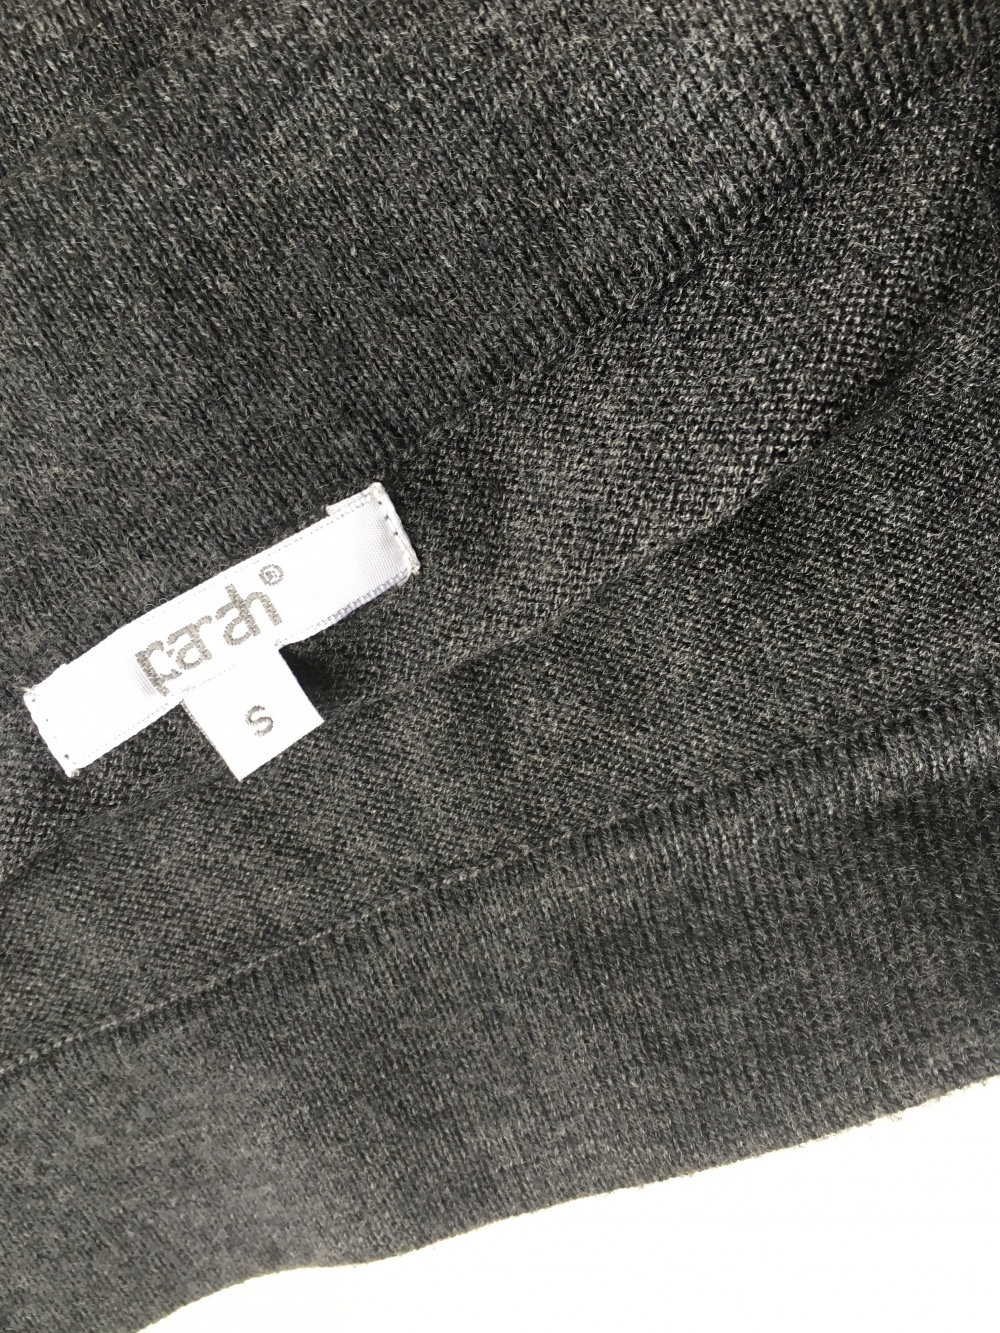 Юбка бренда Parah, размер S